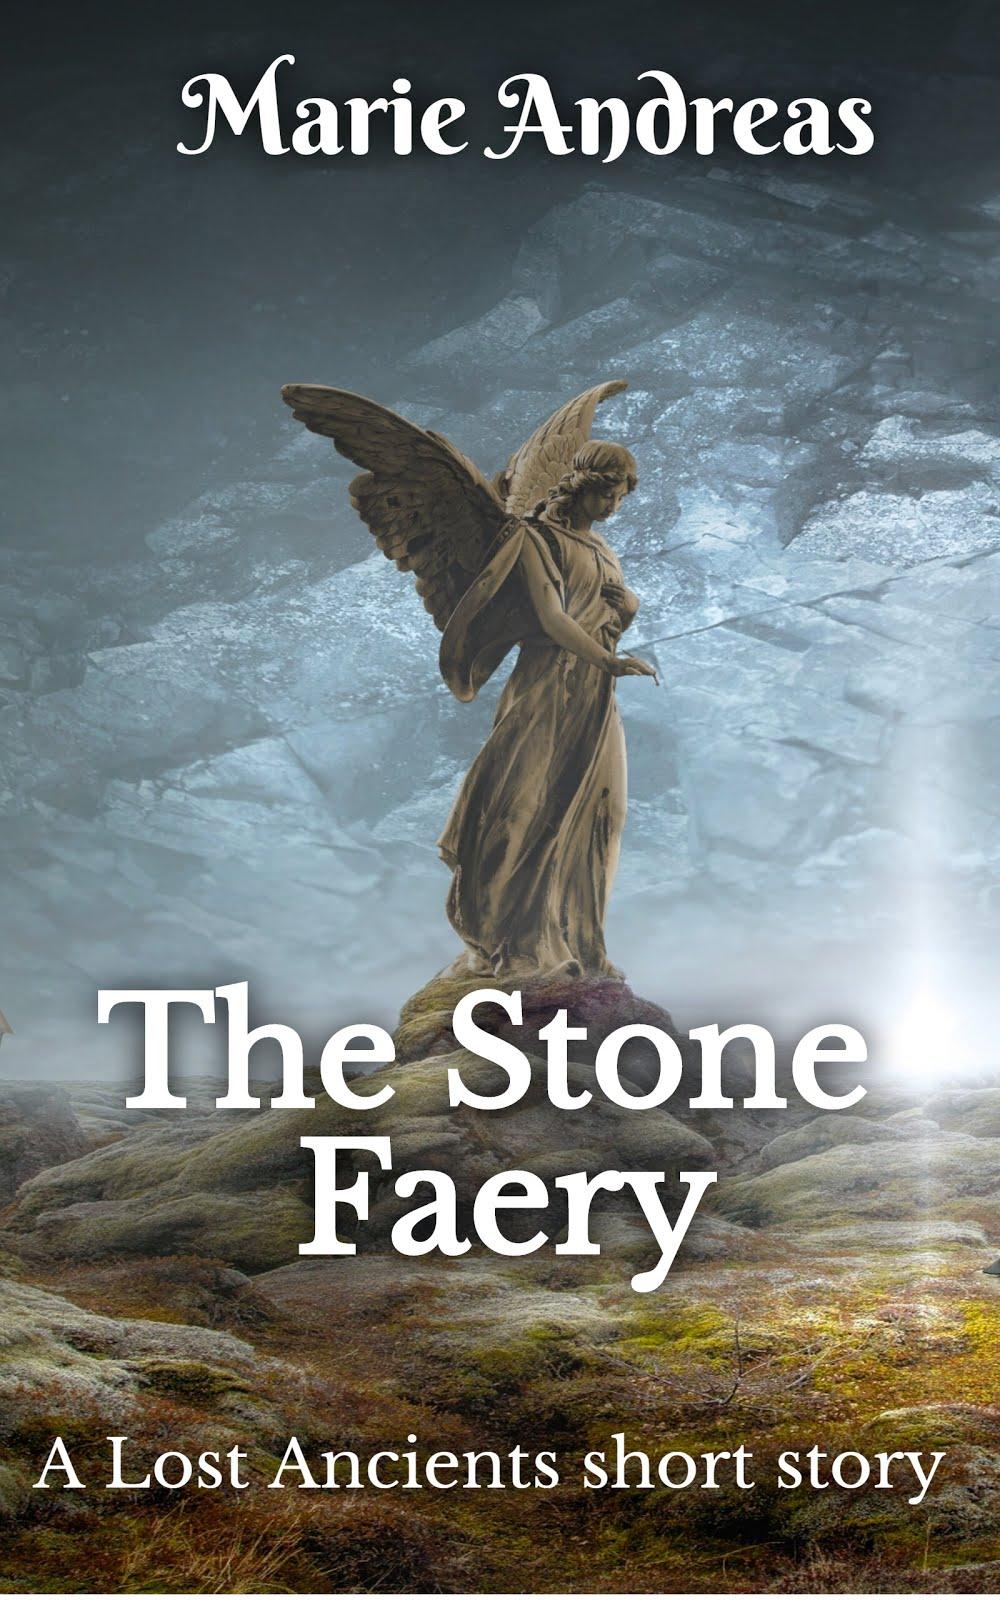 The Stone Faery